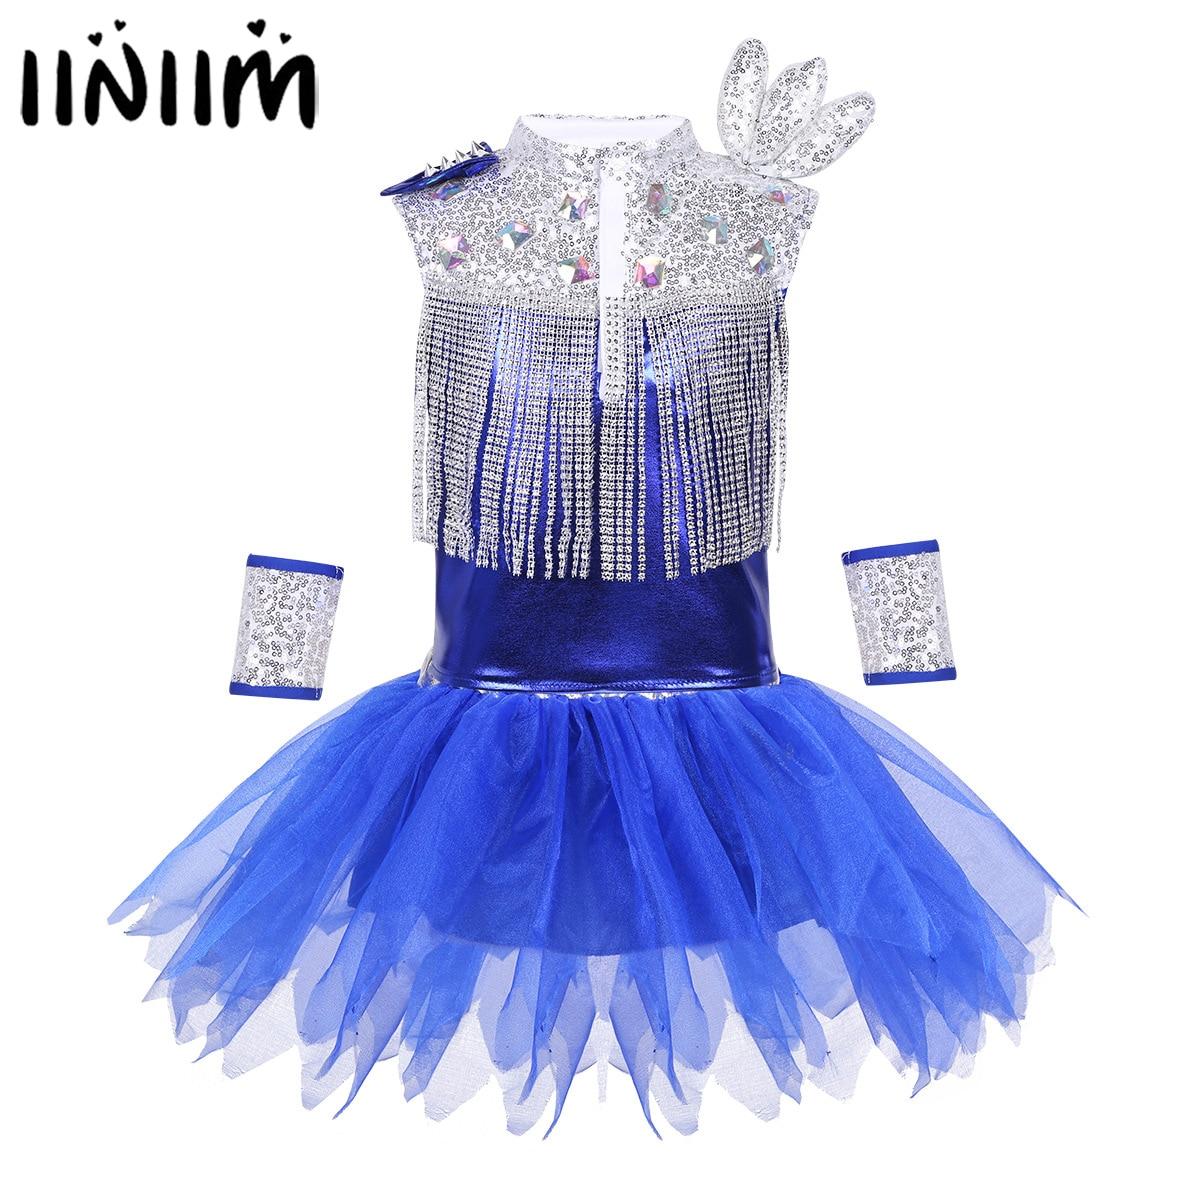 Kids Girls Hip-hop Jazz Costumes Street Dancing Dress Glitter Reflective Rhinestone Tassels Tops with Skirt Wrist-Sleeves Socks